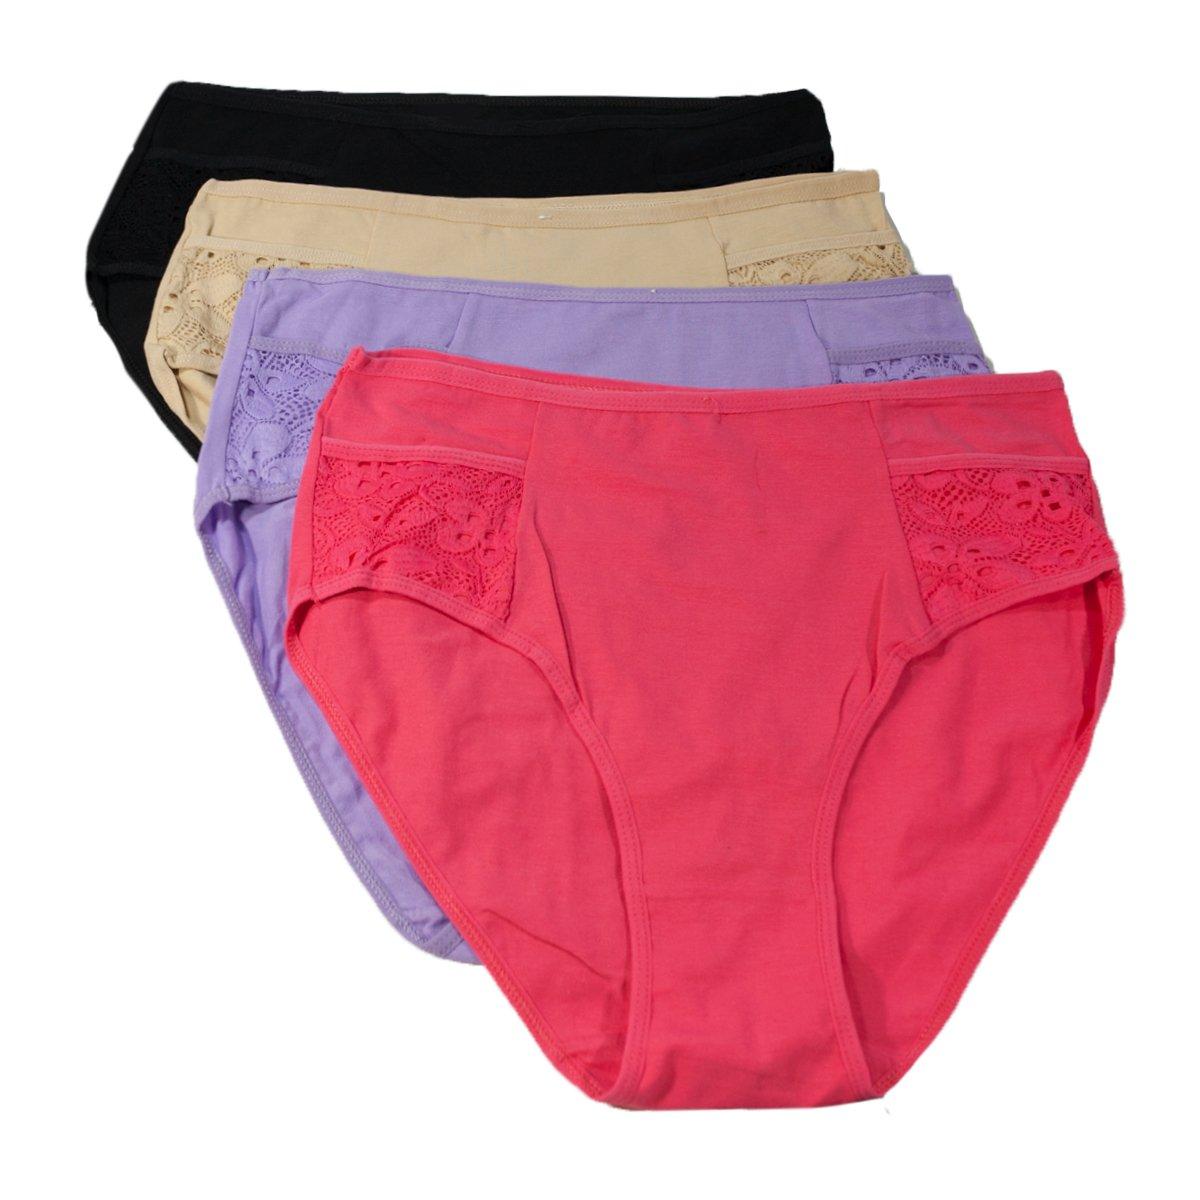 Love Hana Women's Lace Plus Size Brief Panties 4-Pack - XXXL by Love Hana (Image #1)